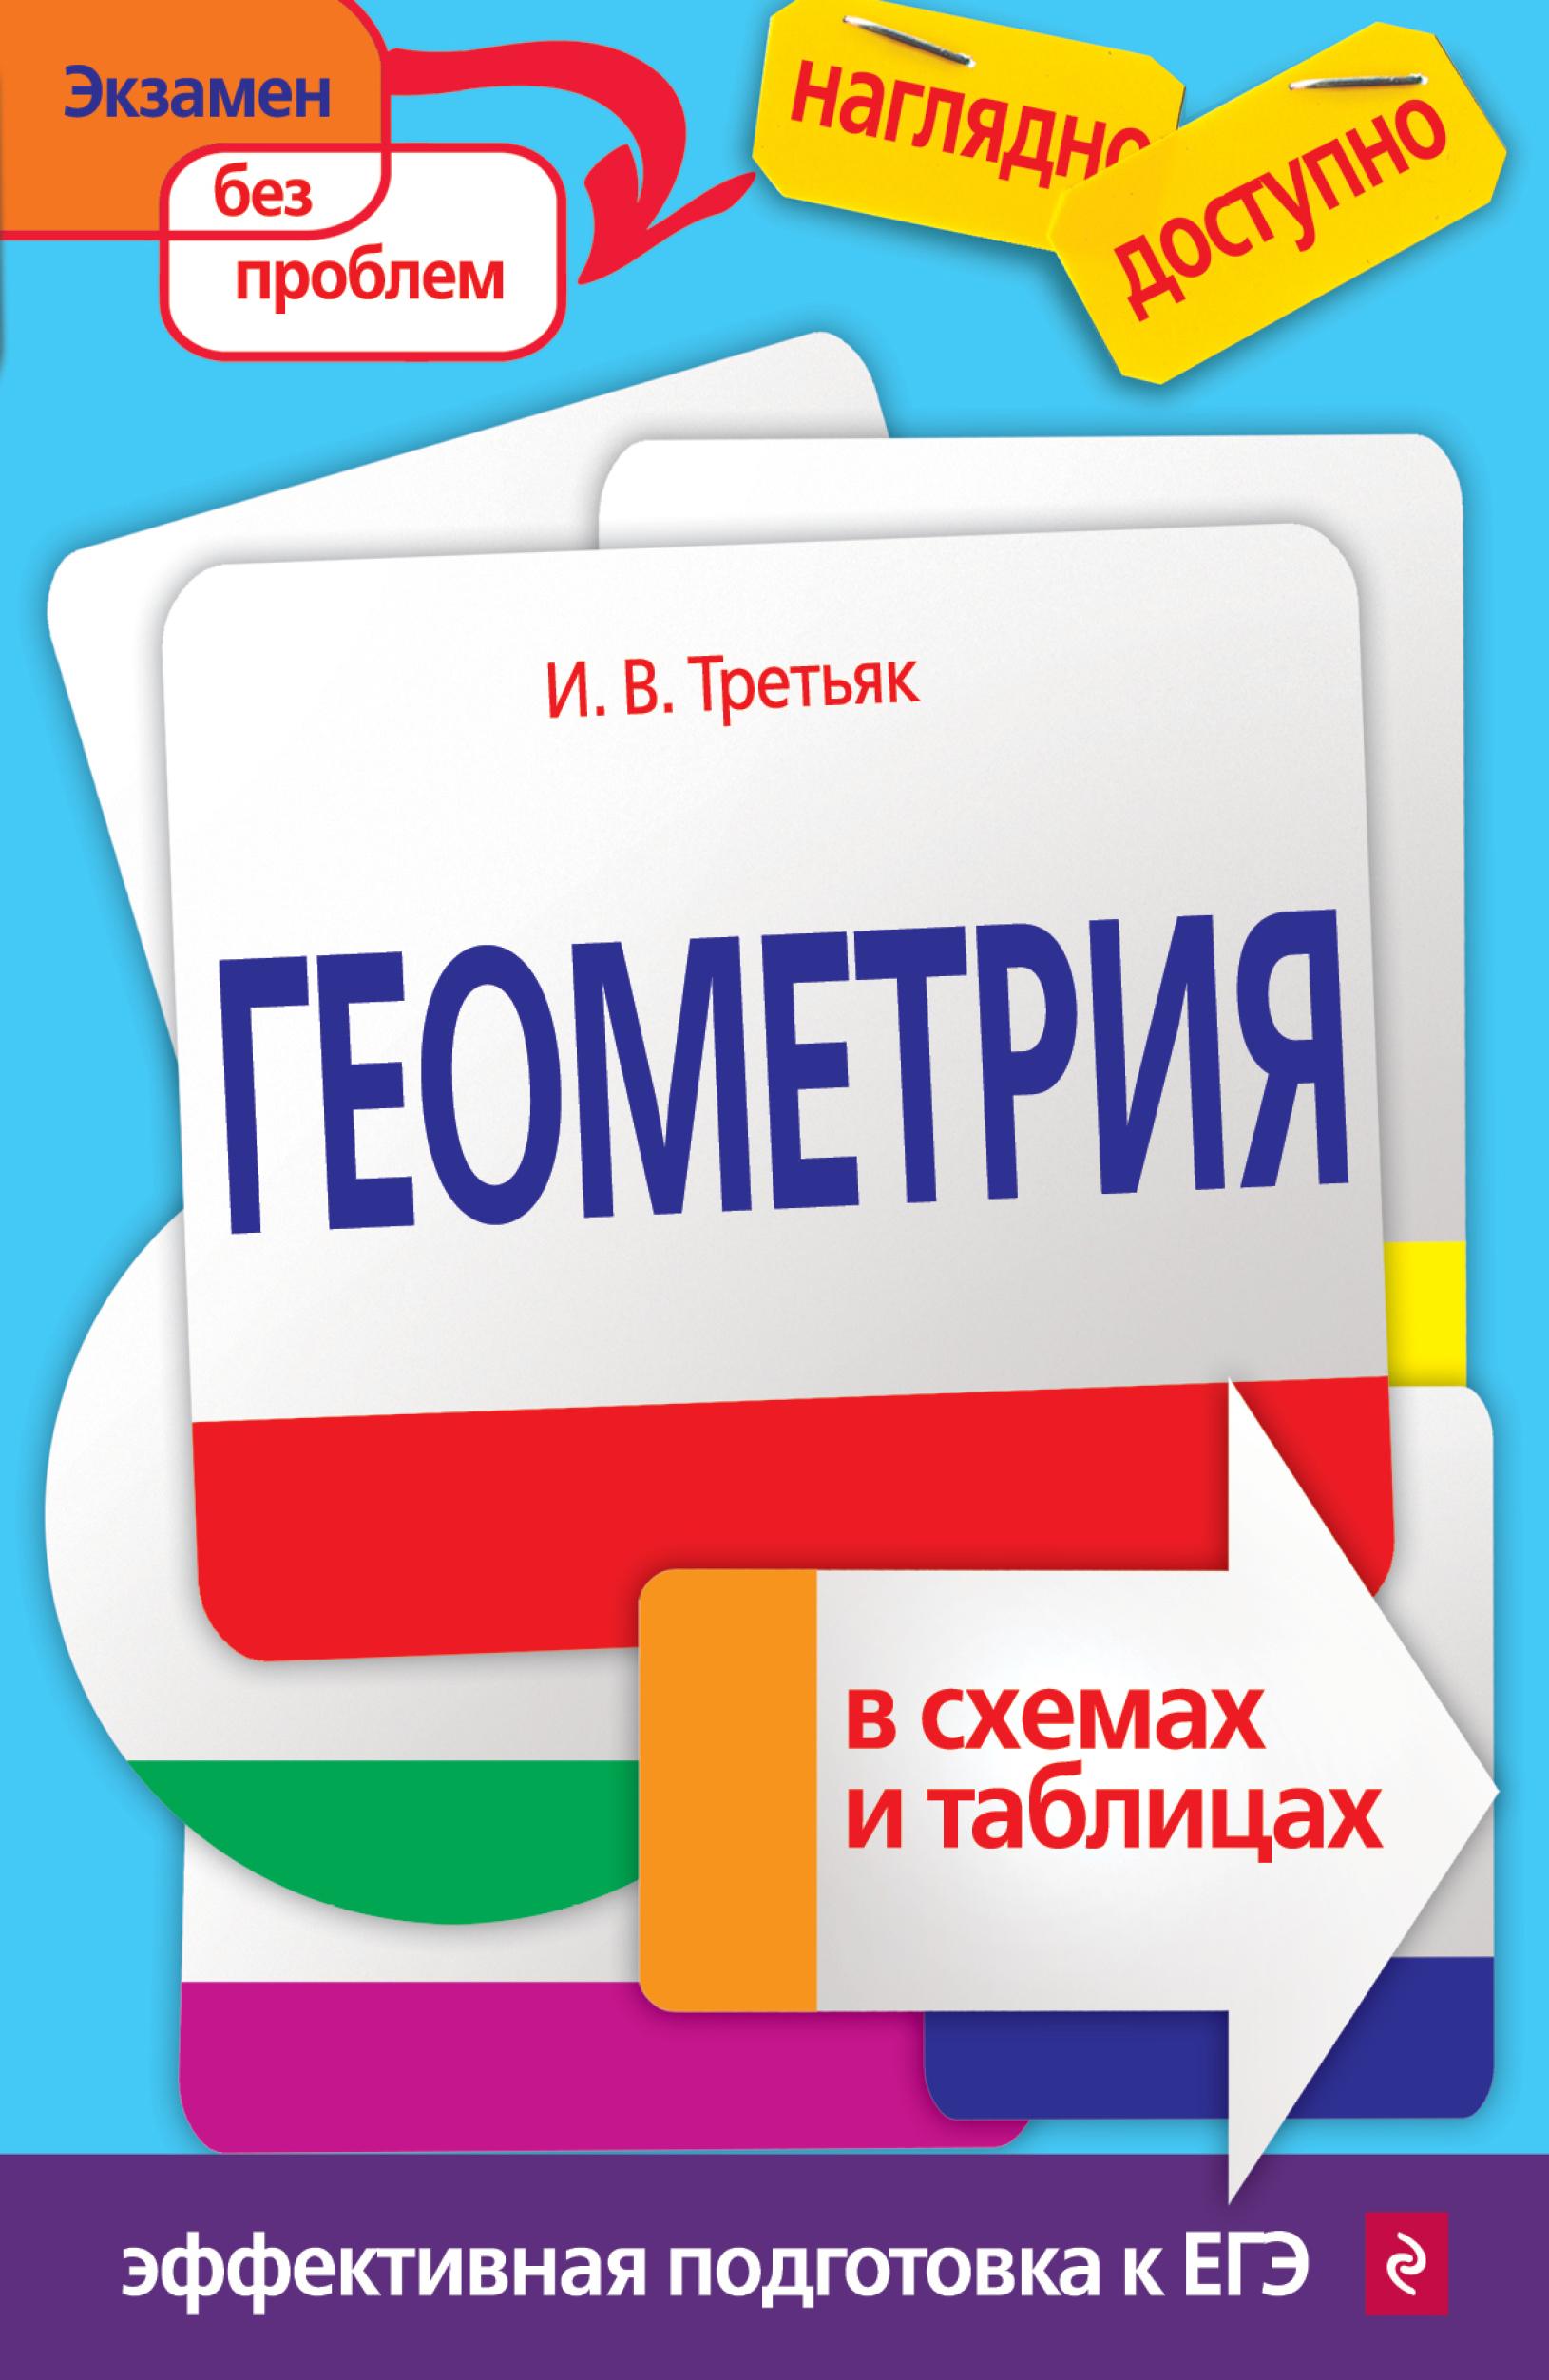 И. В. Третьяк Геометрия в схемах и таблицах ирина третьяк геометрия в схемах и таблицах